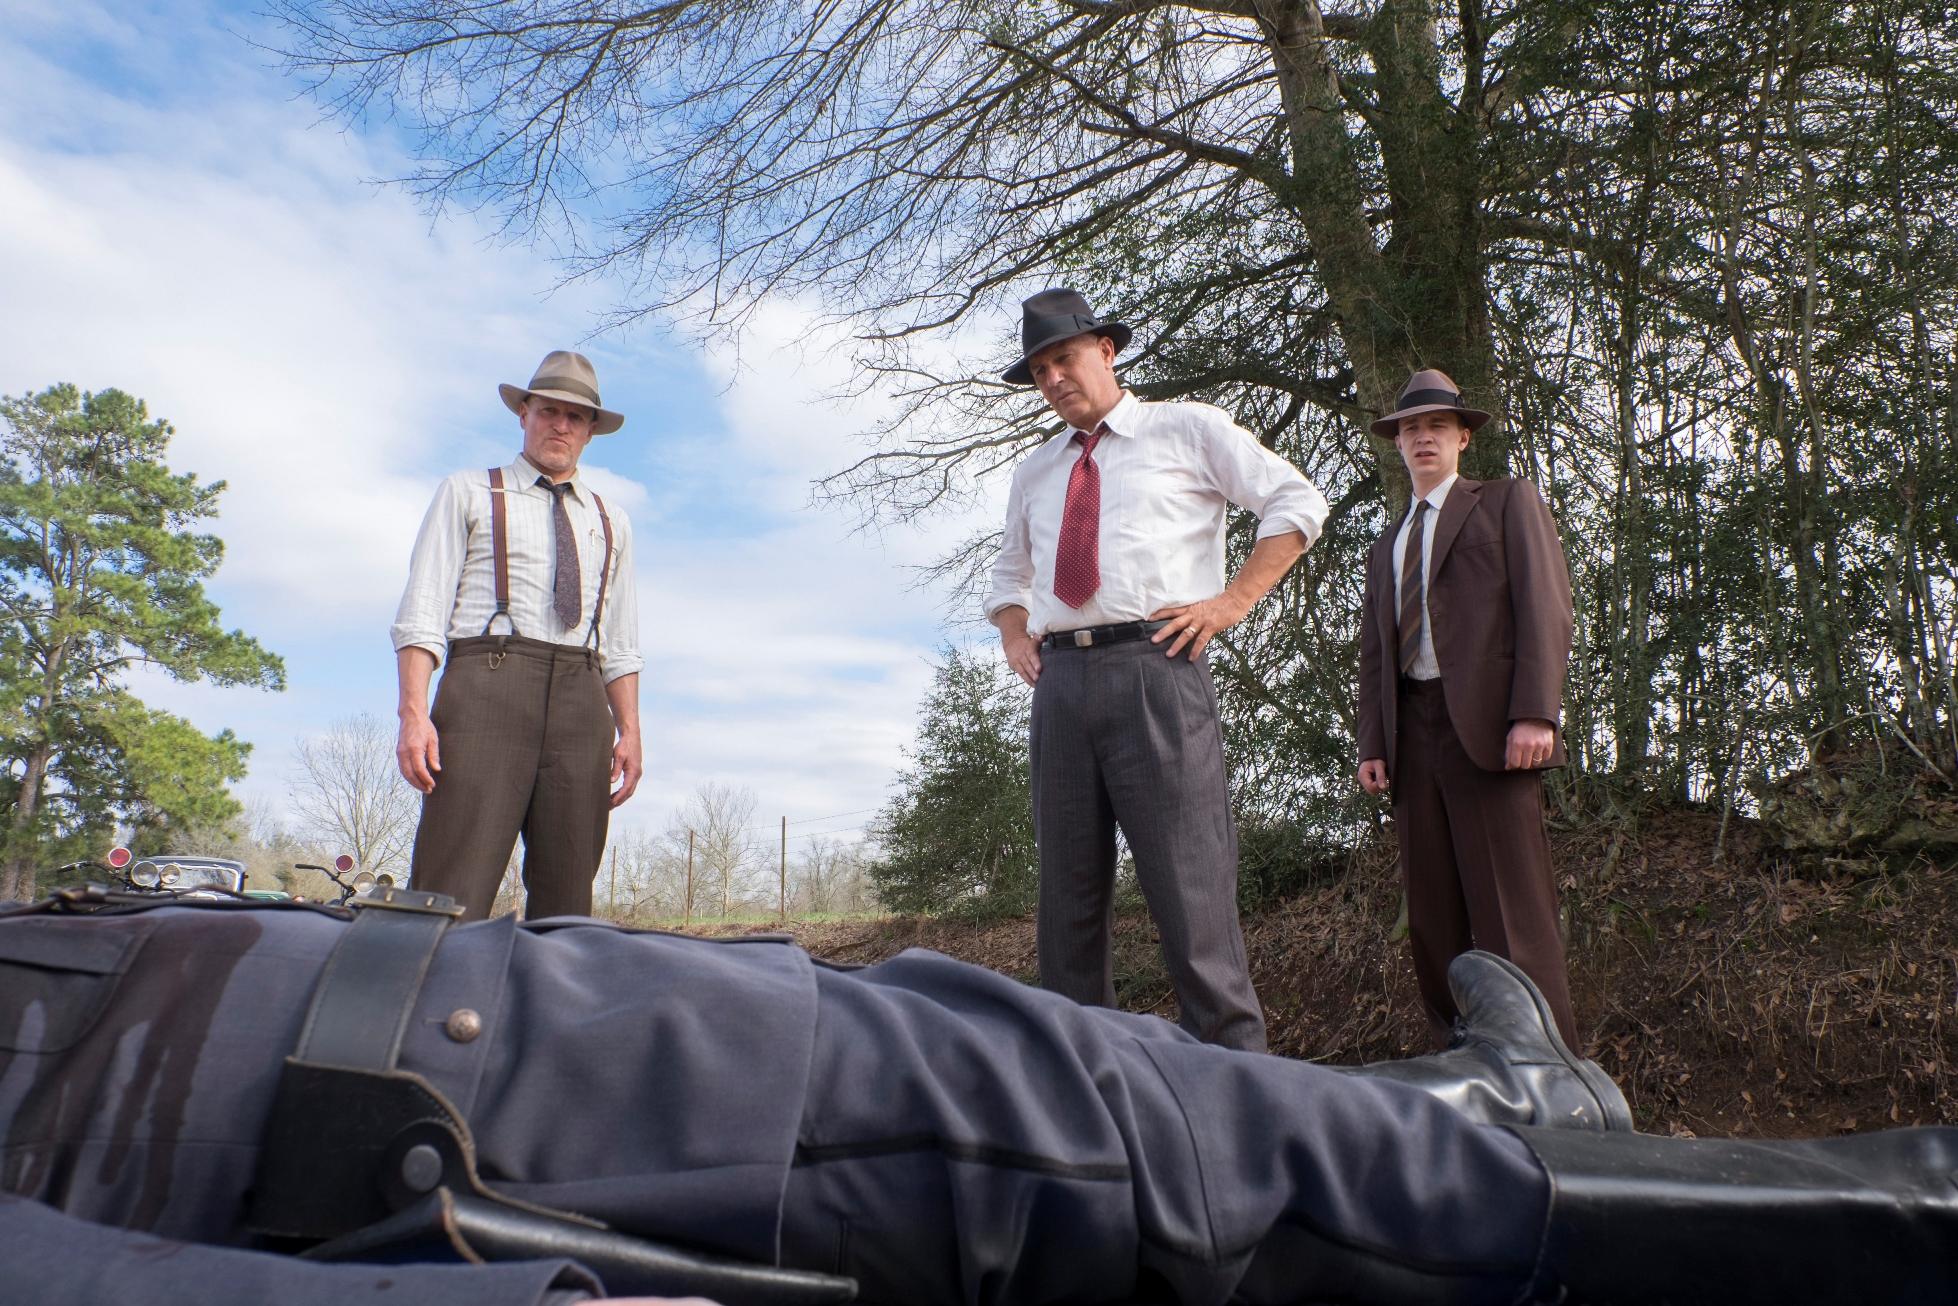 Highwaymen - L'ultima Imboscata: Kevin Costner insieme a Woody Harrelson in una scena del film